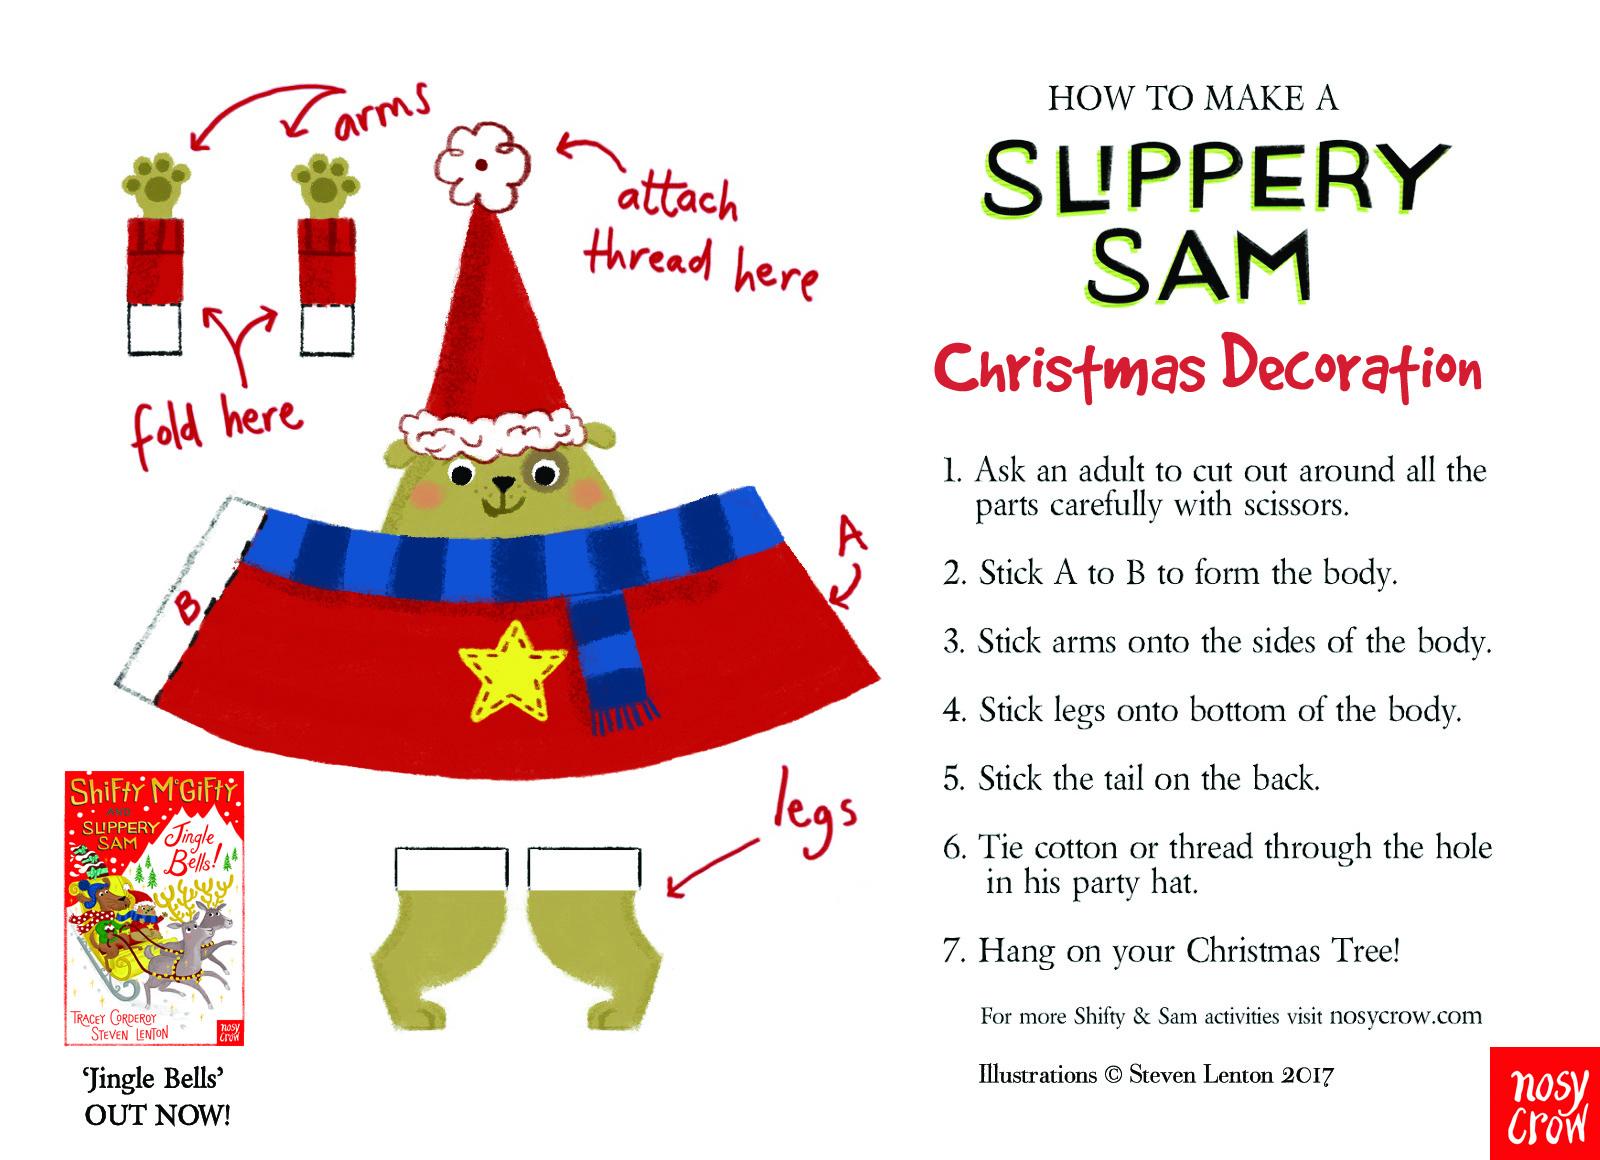 Sam-Christmas-Decoration-Jingle-Bells-Edition_1600.jpg